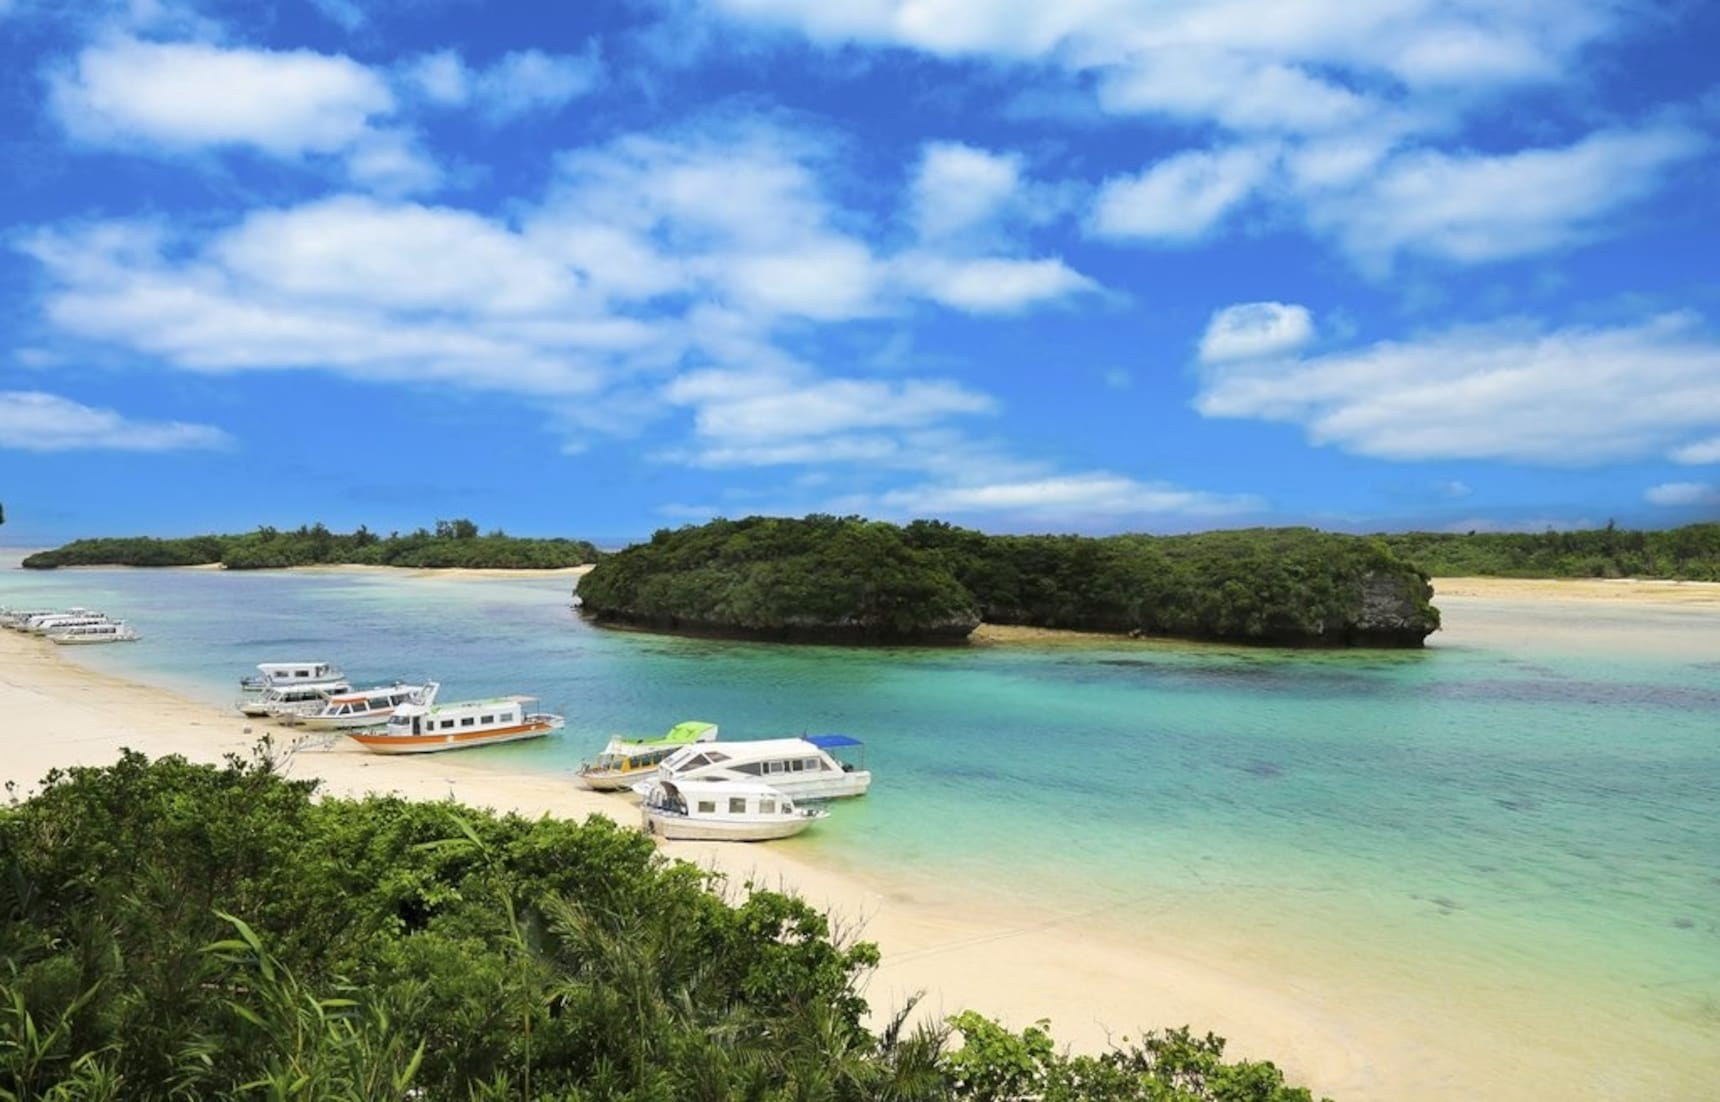 Top 10 Islands Around Okinawa for Beach Lovers